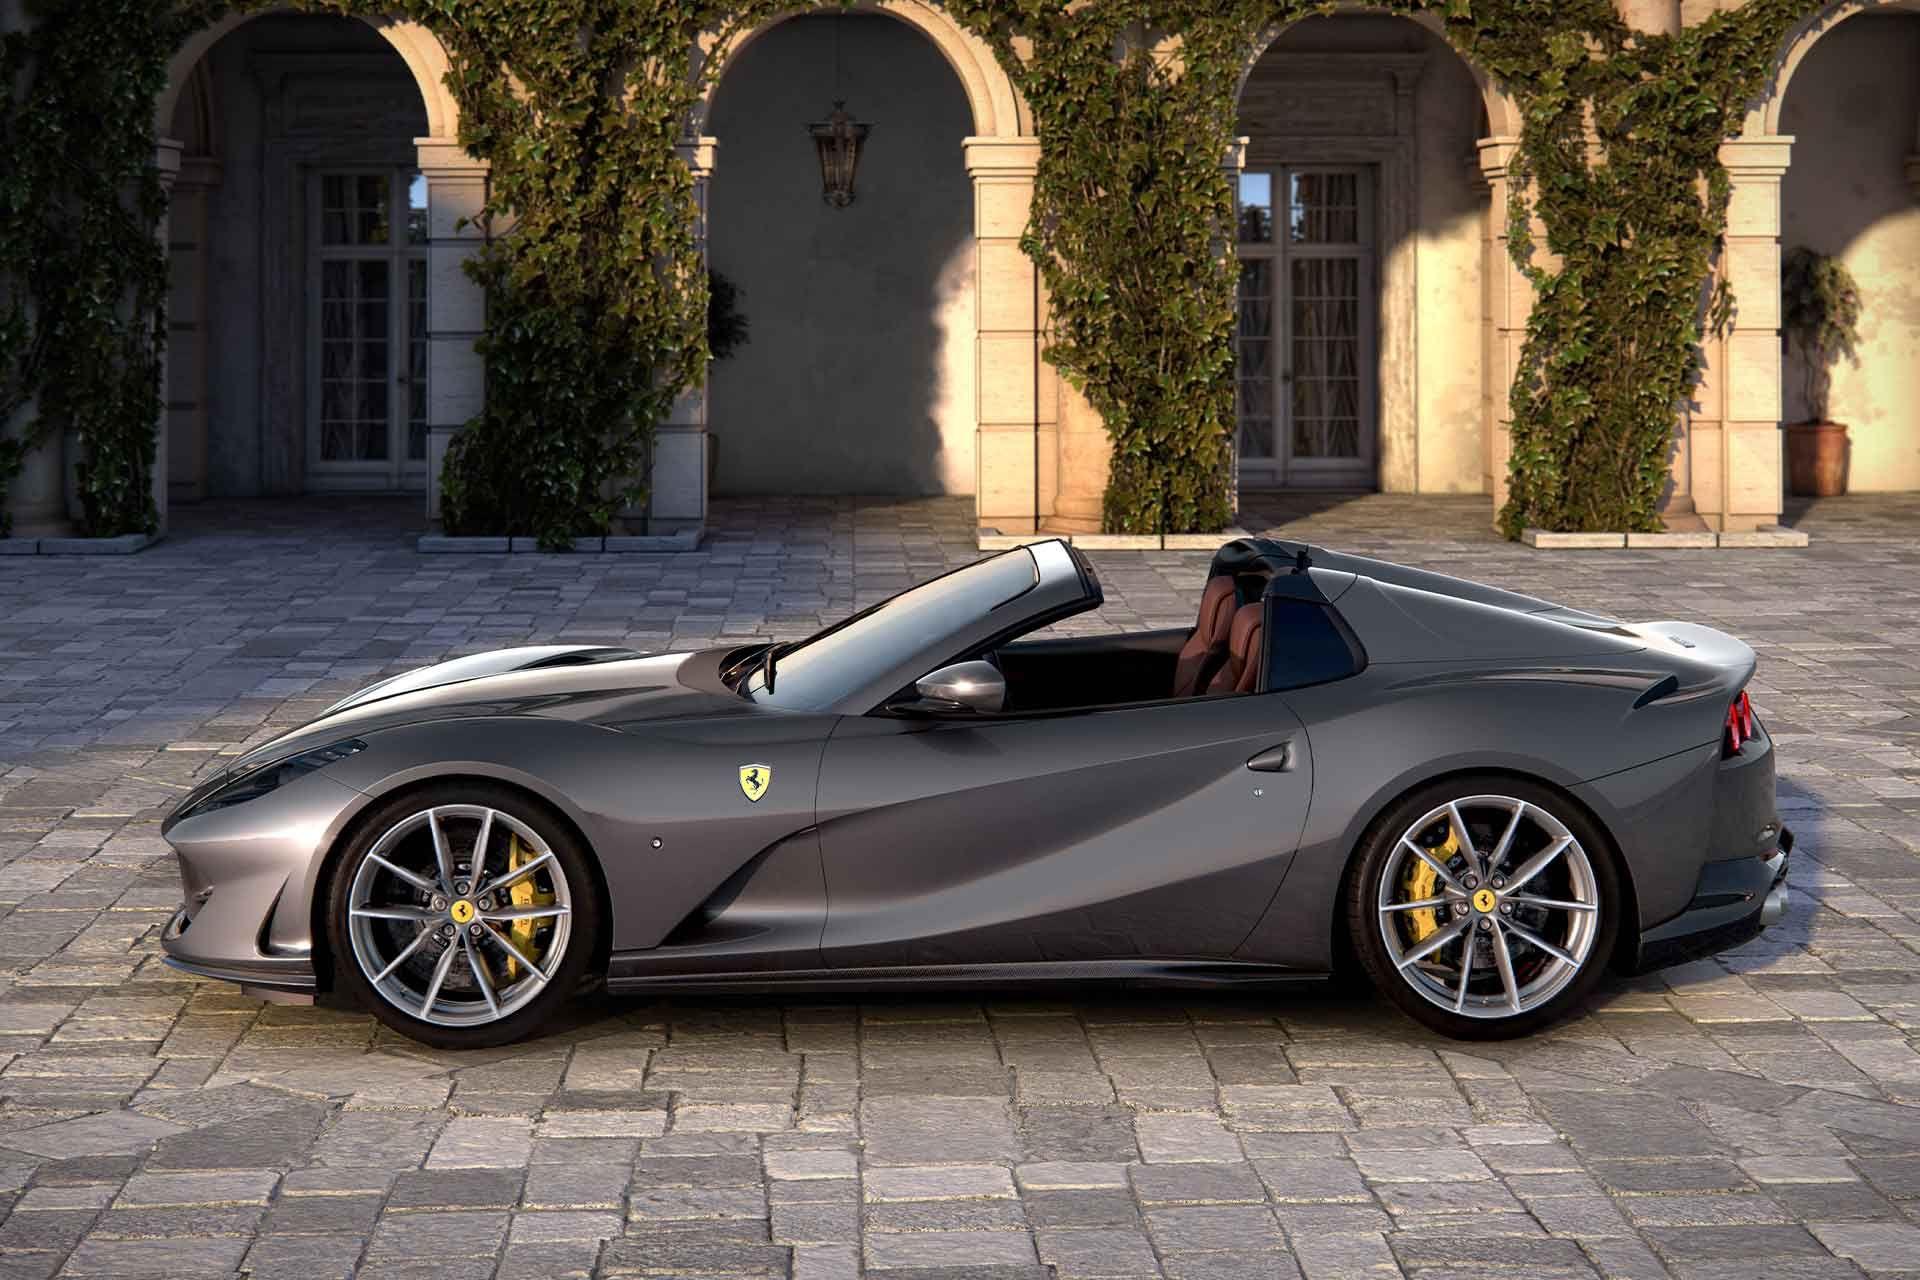 Ferrari 812 Gts Convertible With Images Ferrari Convertible